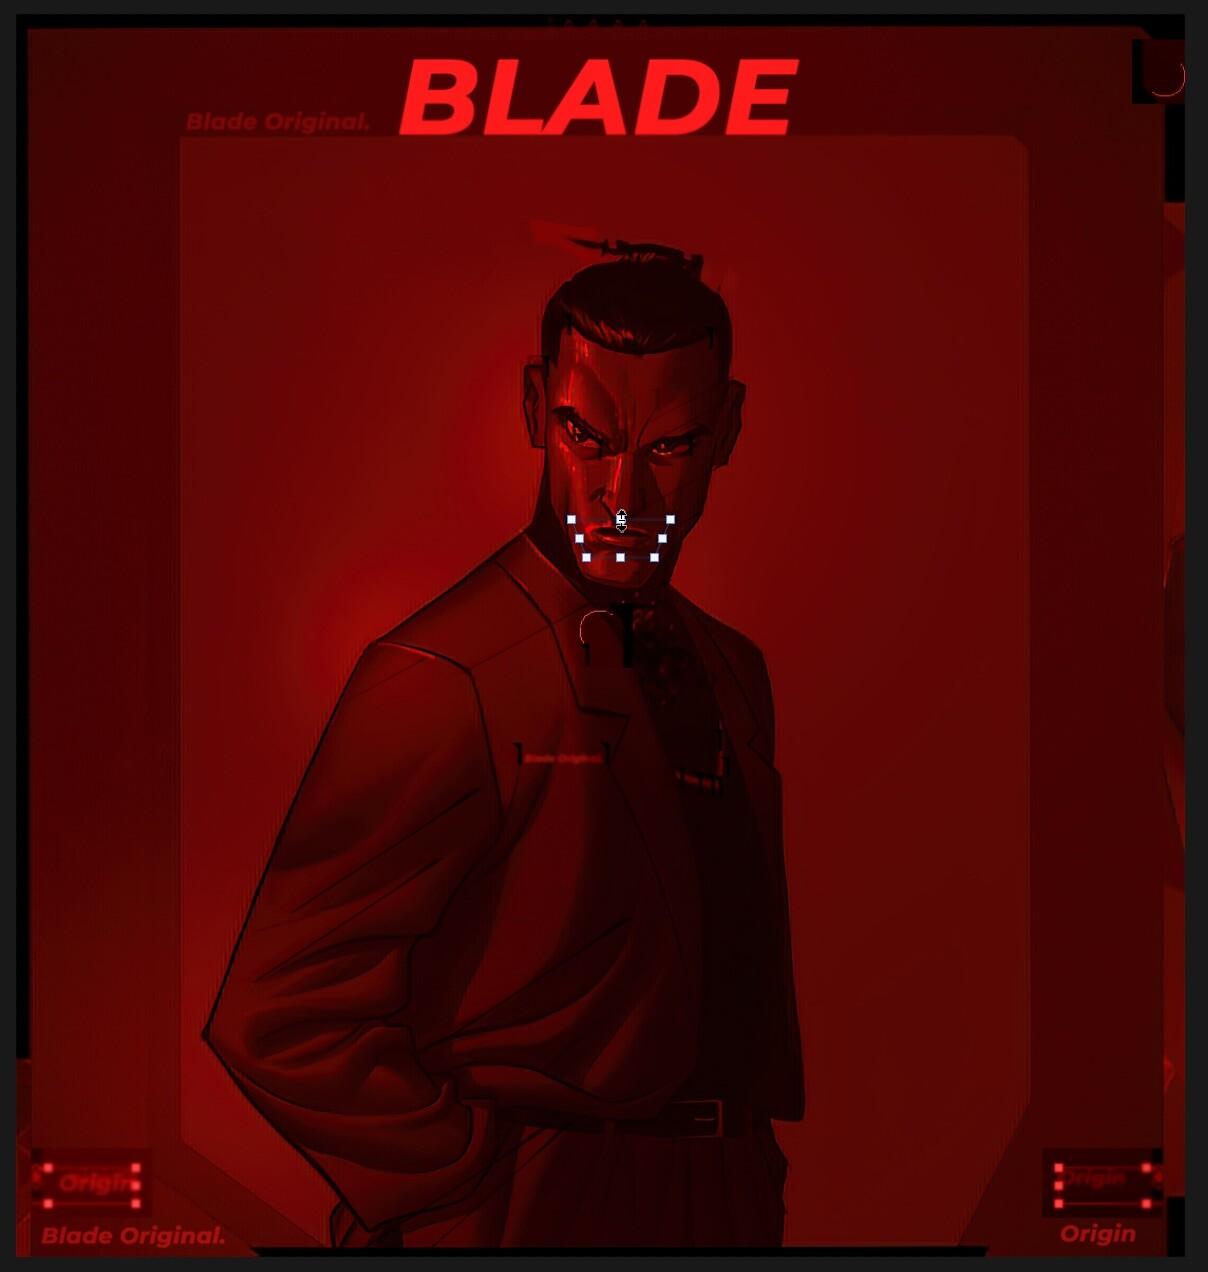 BLADE - The Origin.